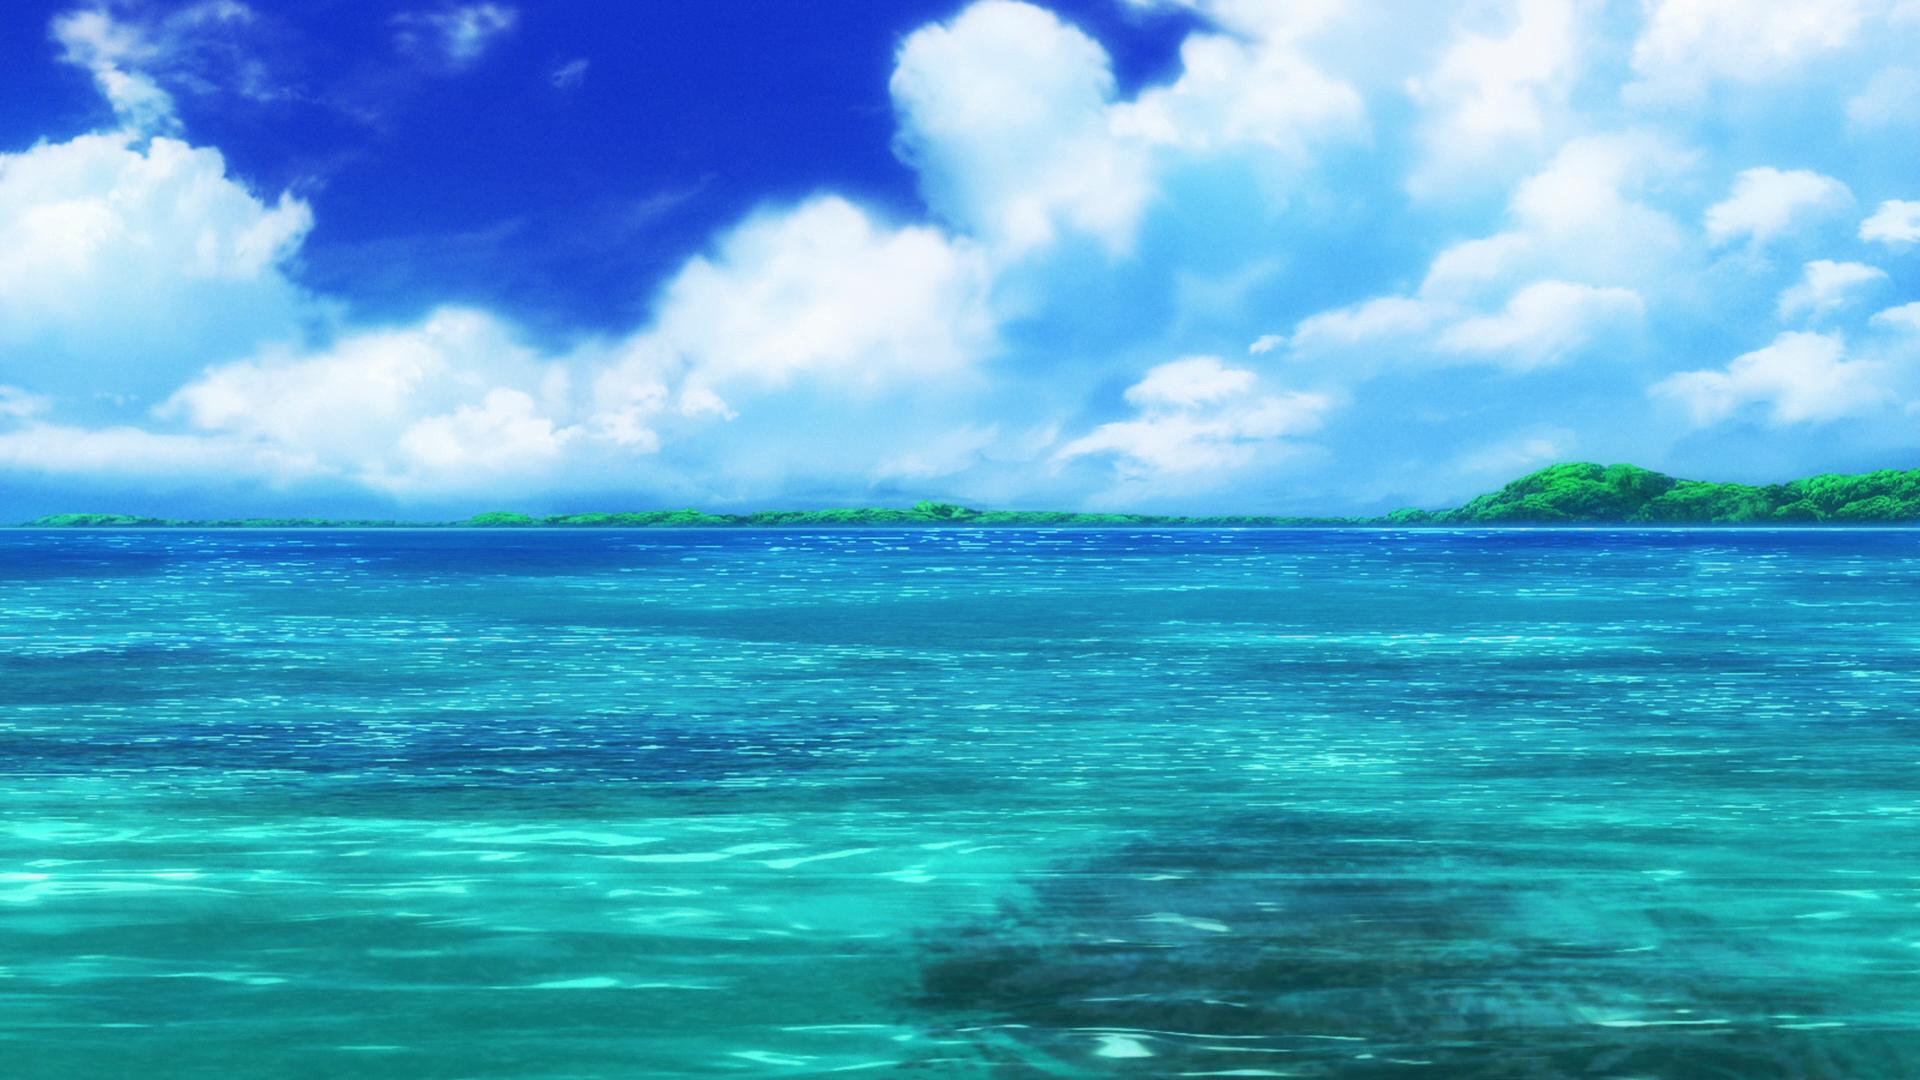 Anime 1920x1080 Non Non Biyori nature sea anime water artwork blue clouds turquoise